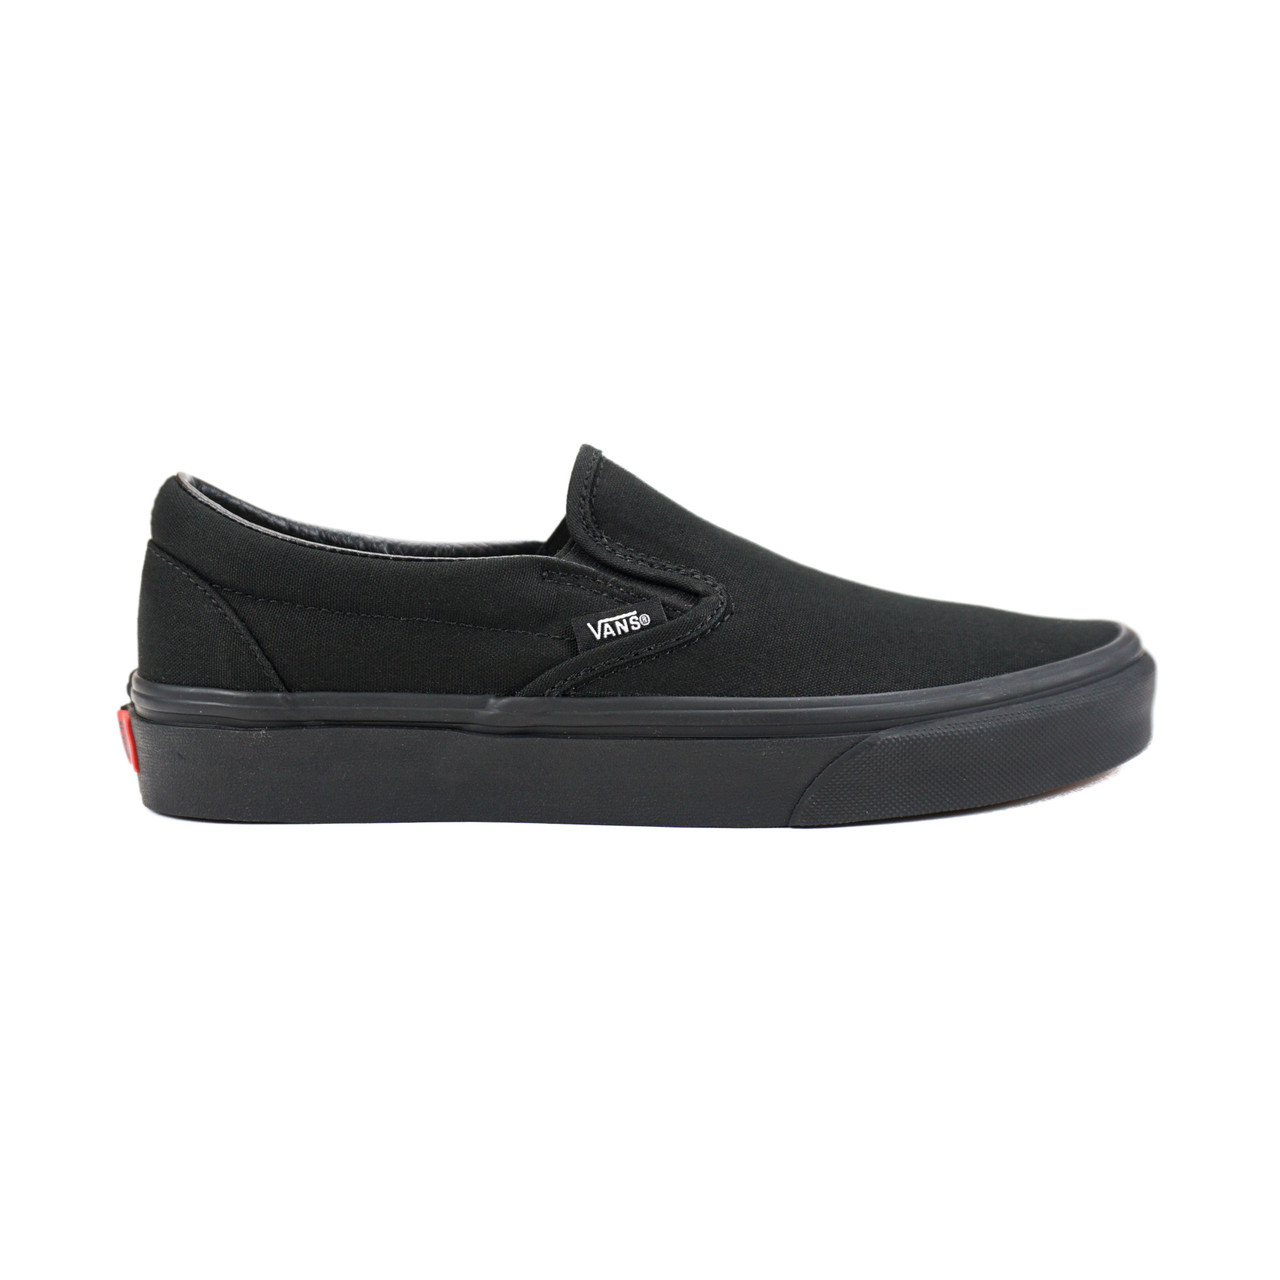 7dd906403fdd09 Vans Classic Slip On in Black Black color